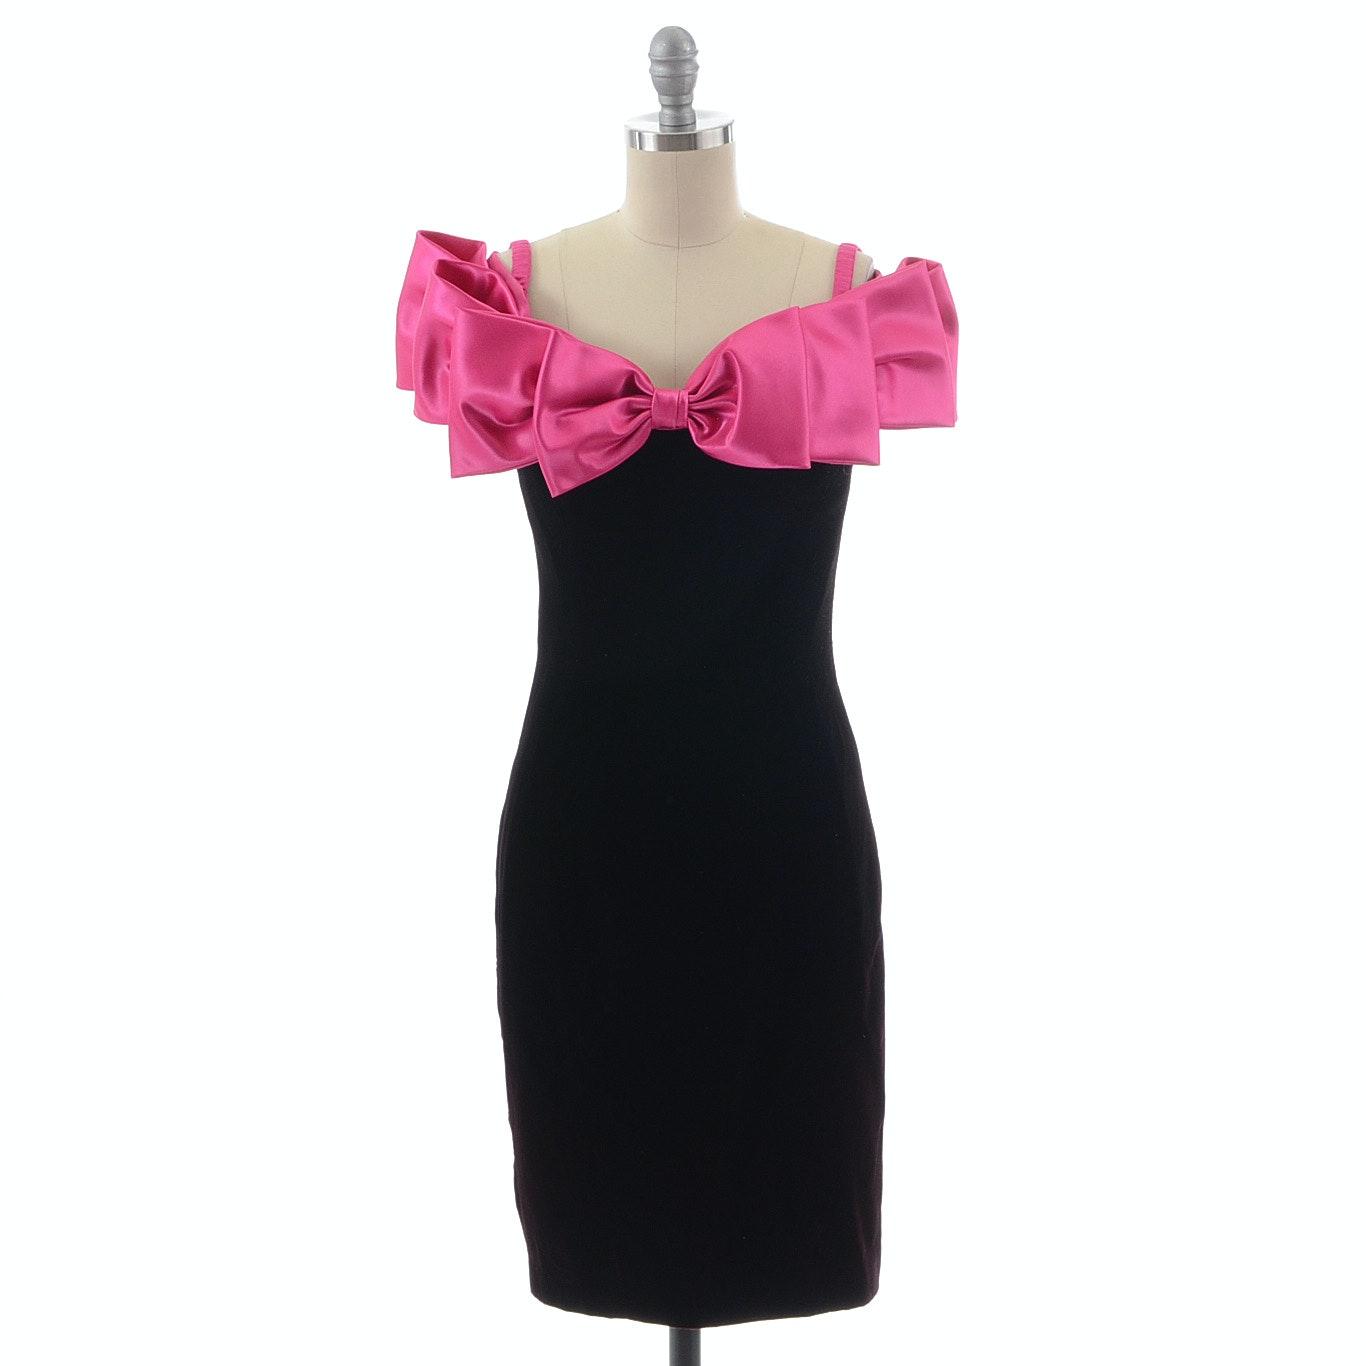 1990s A.J. Bari Black Velvet and Fuschia Pink Satin Sleeveless Cocktail Dress with Flat Bows